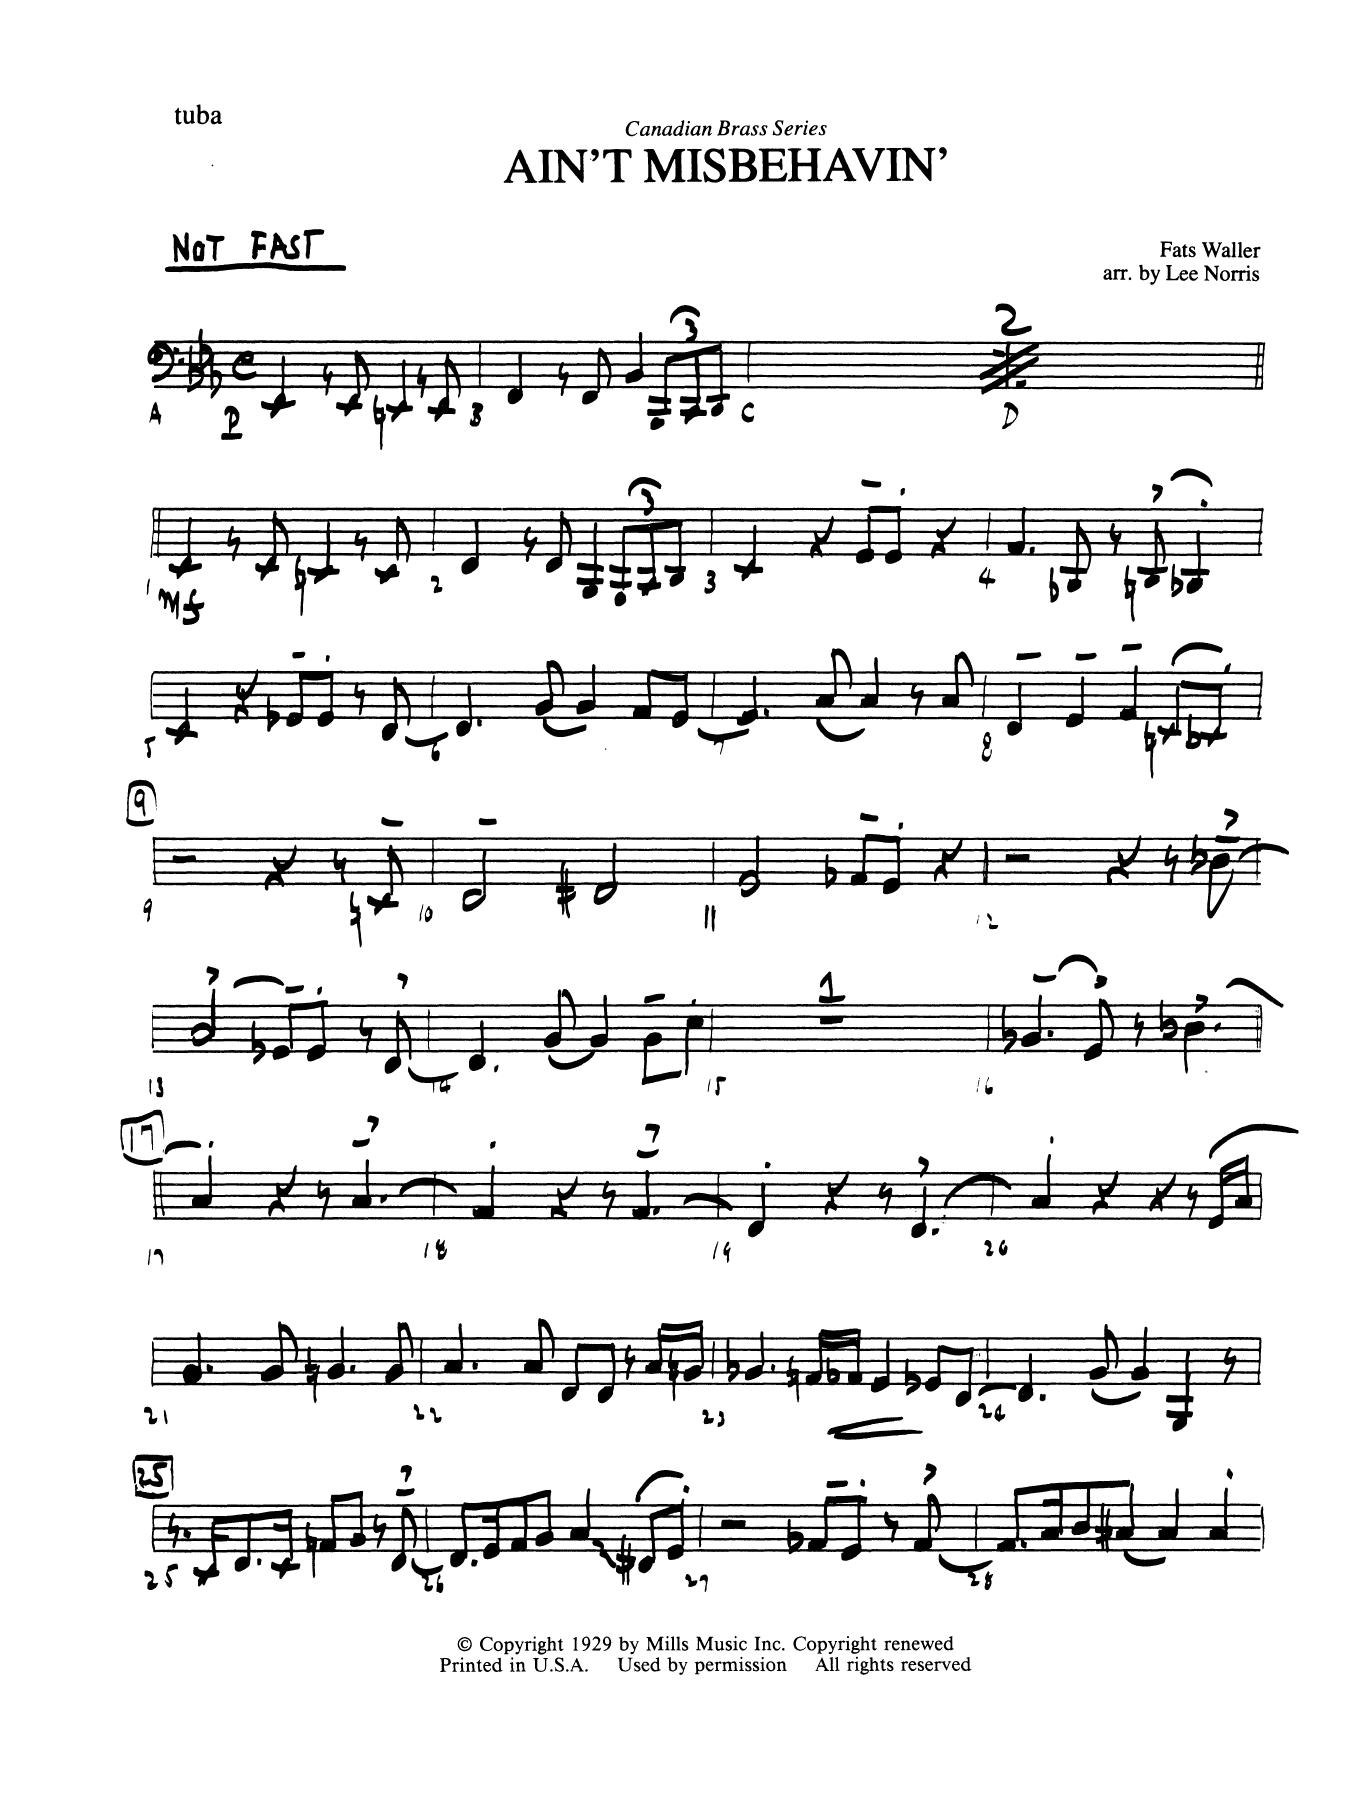 Ain't Misbehavin' - Tuba Sheet Music